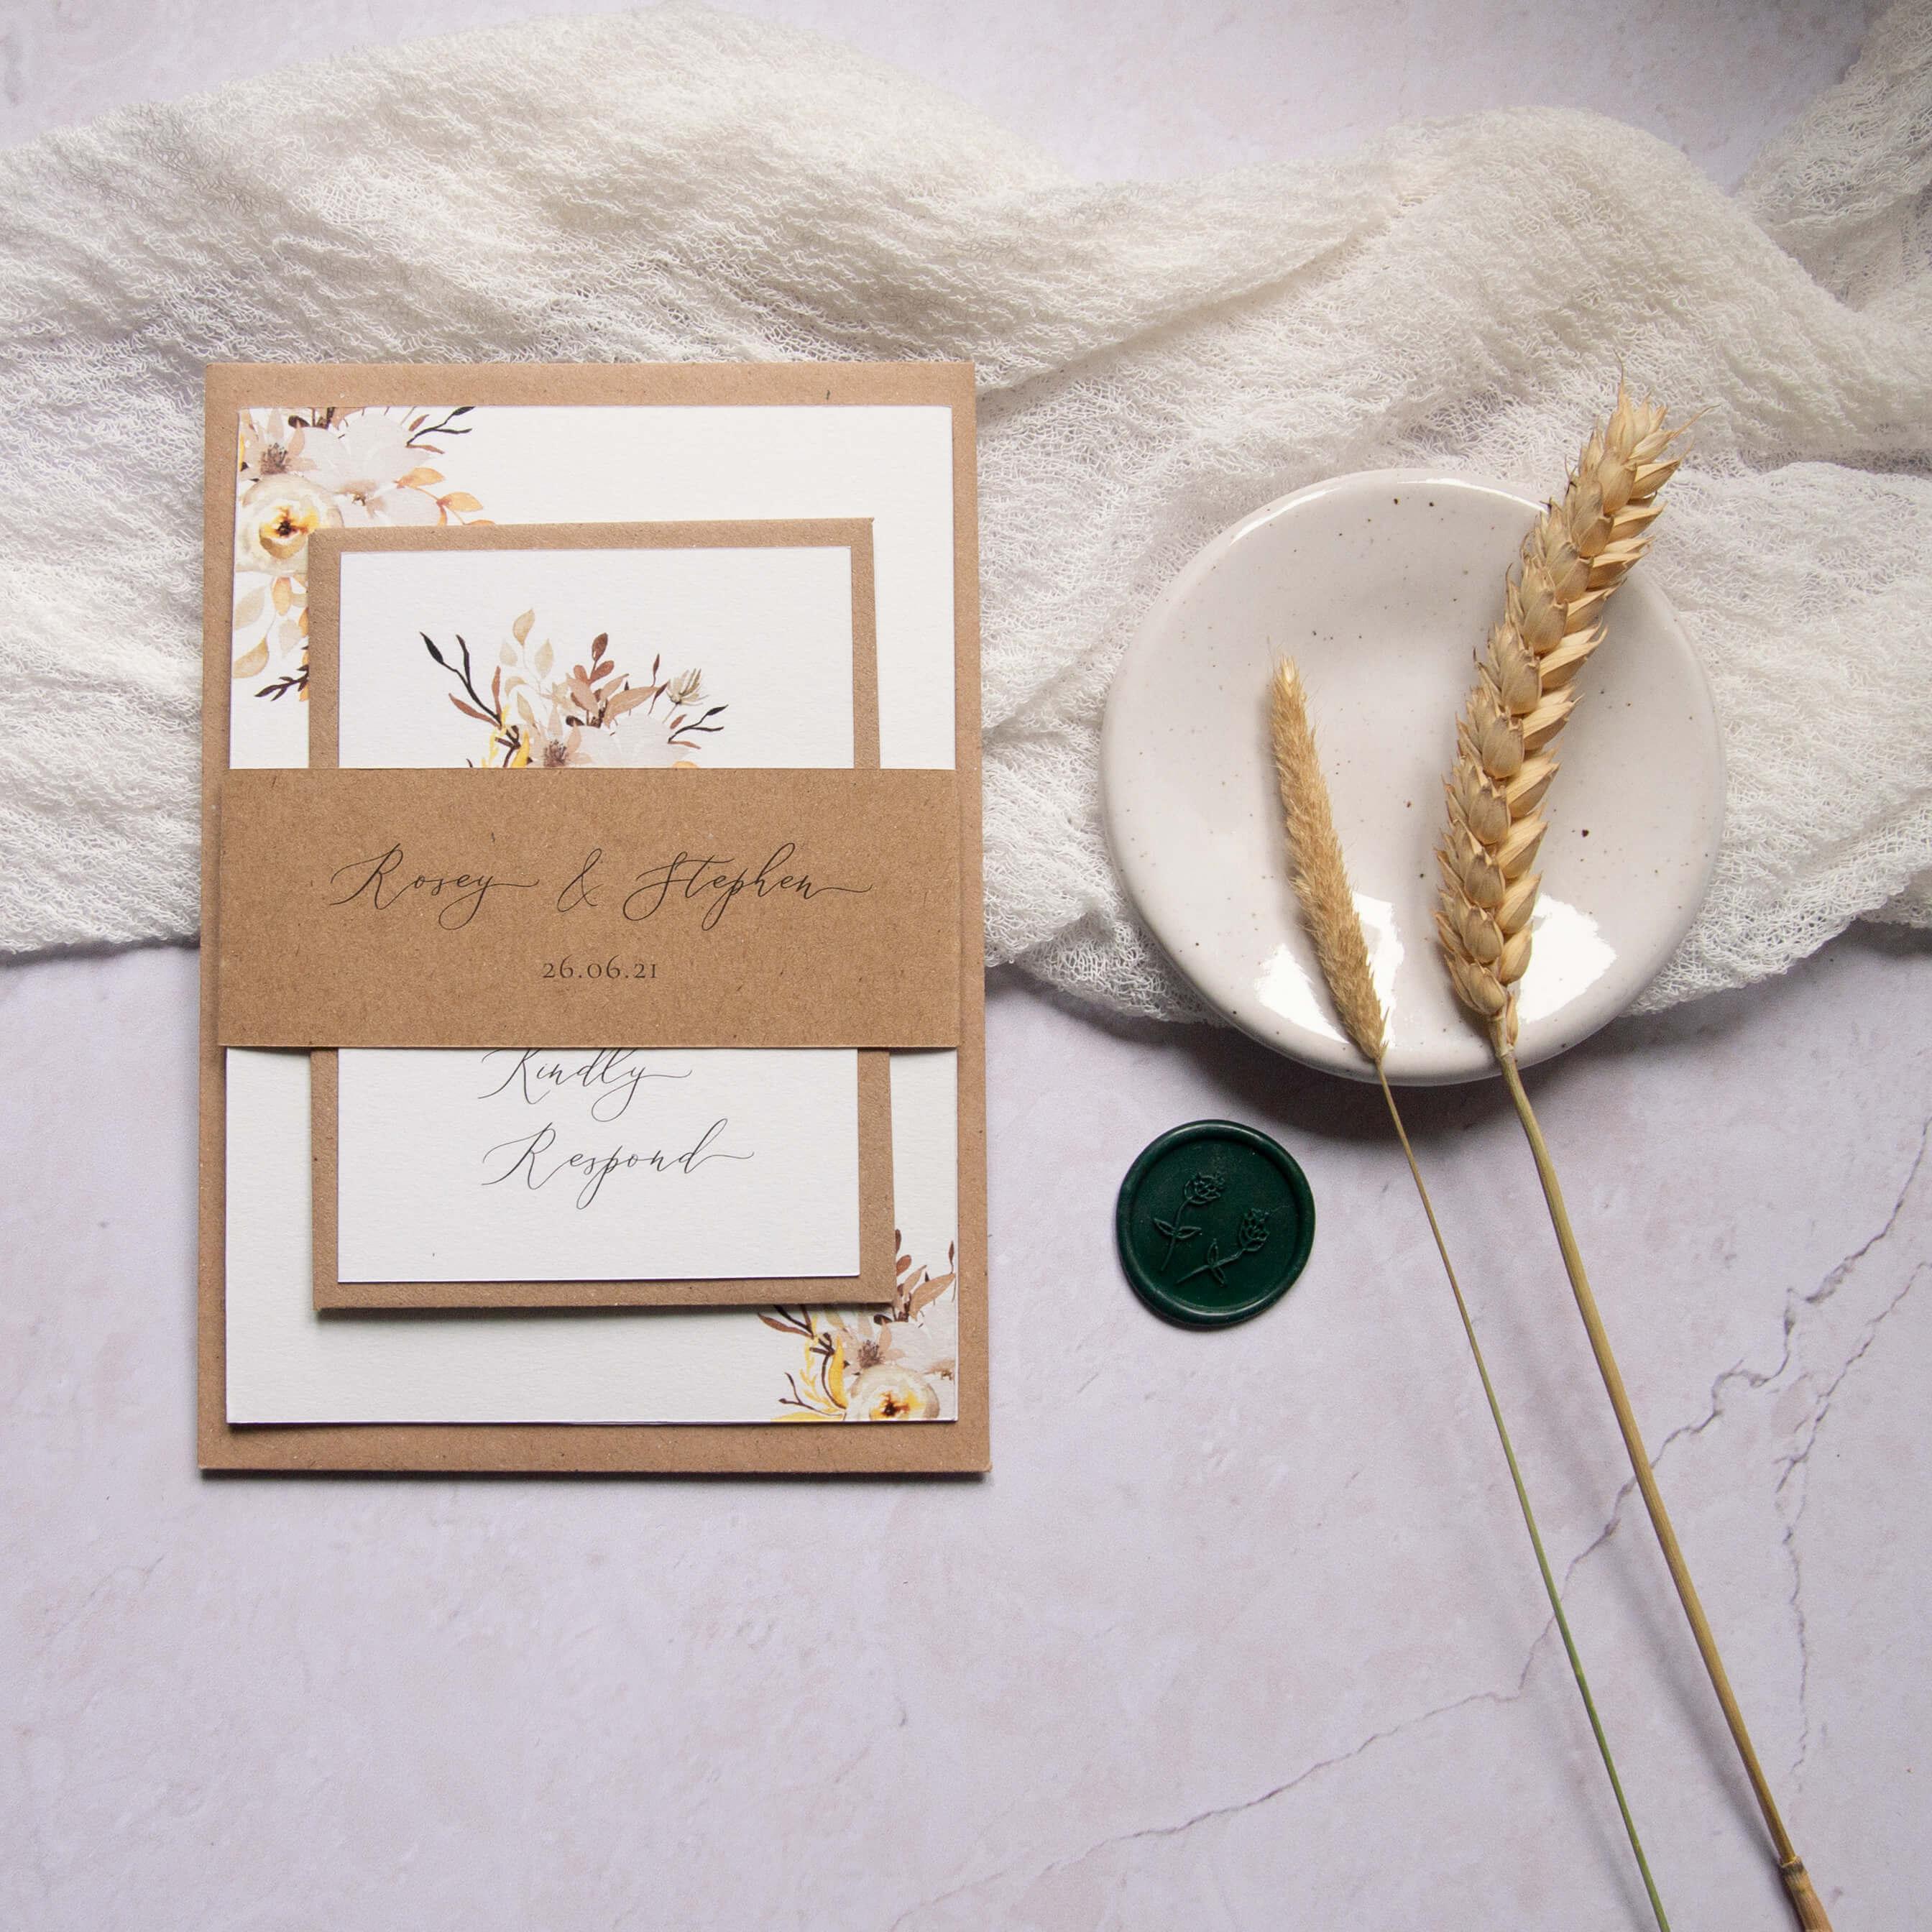 Ellie-and-Liv-Autumn-Harvest-wedding-stationery-collection-bundle-flatlay